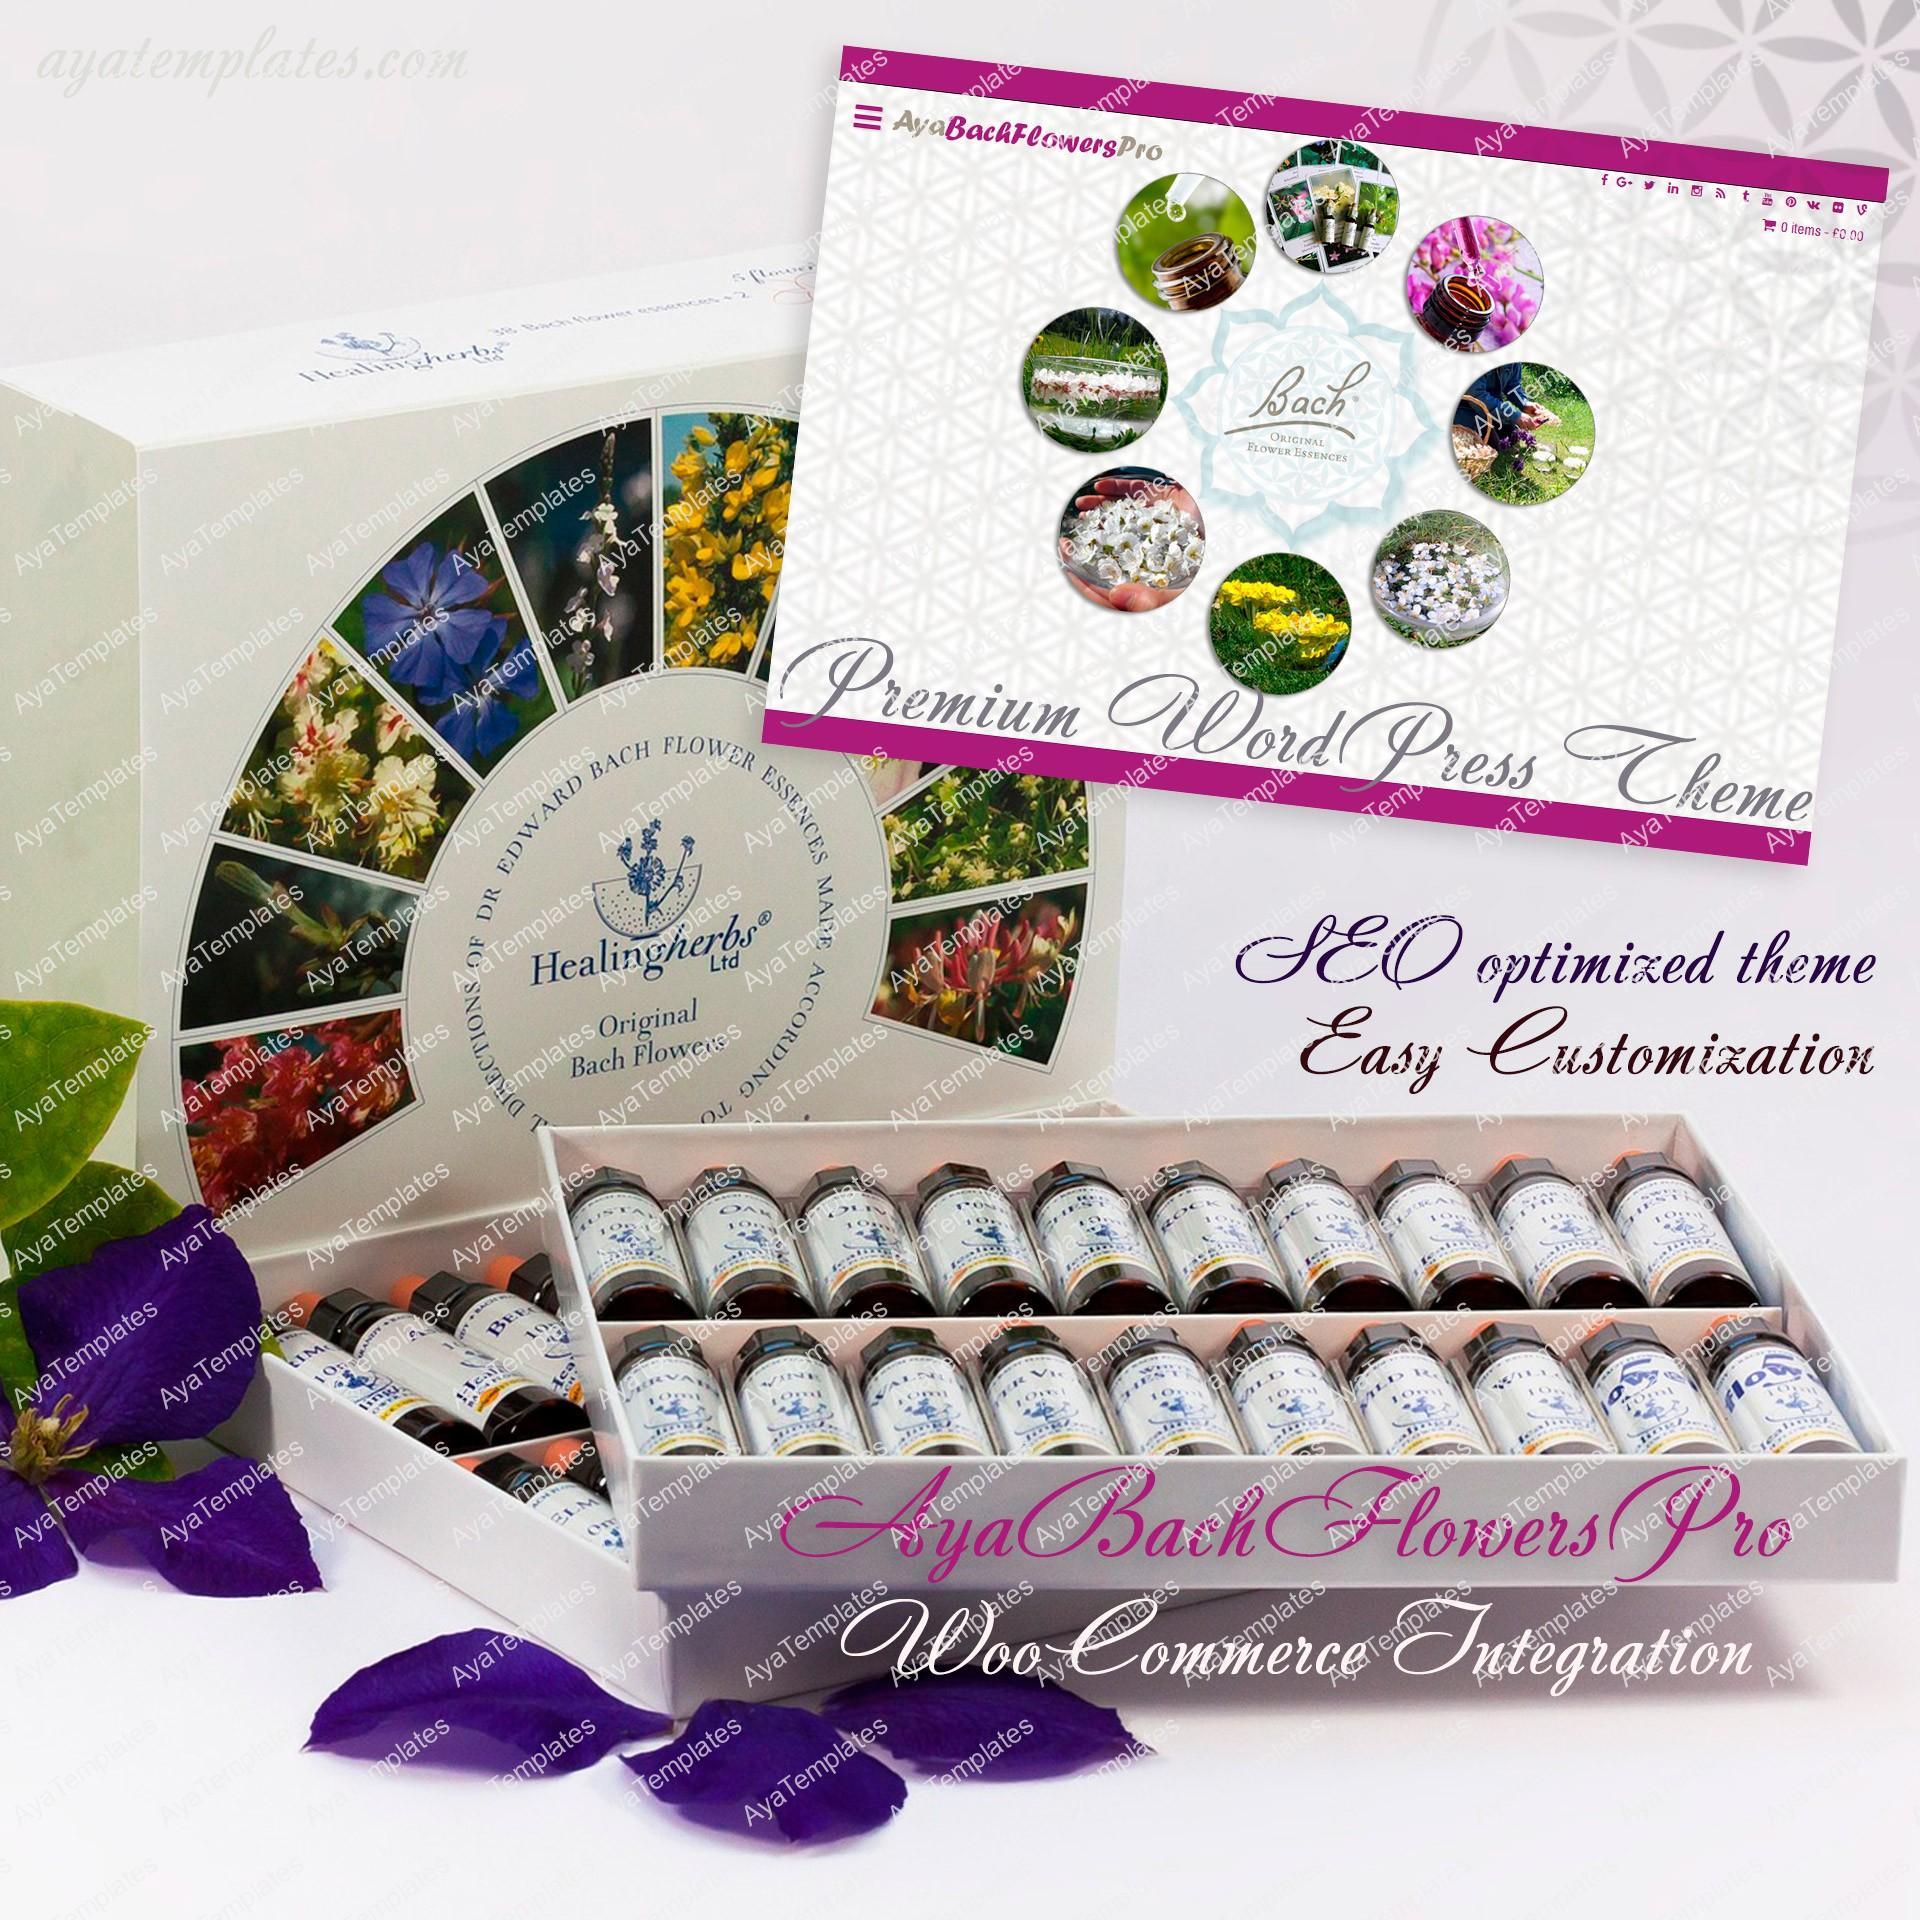 ayabachflowerspro-premium-wordpress-theme-mockup-ayatemplates-com